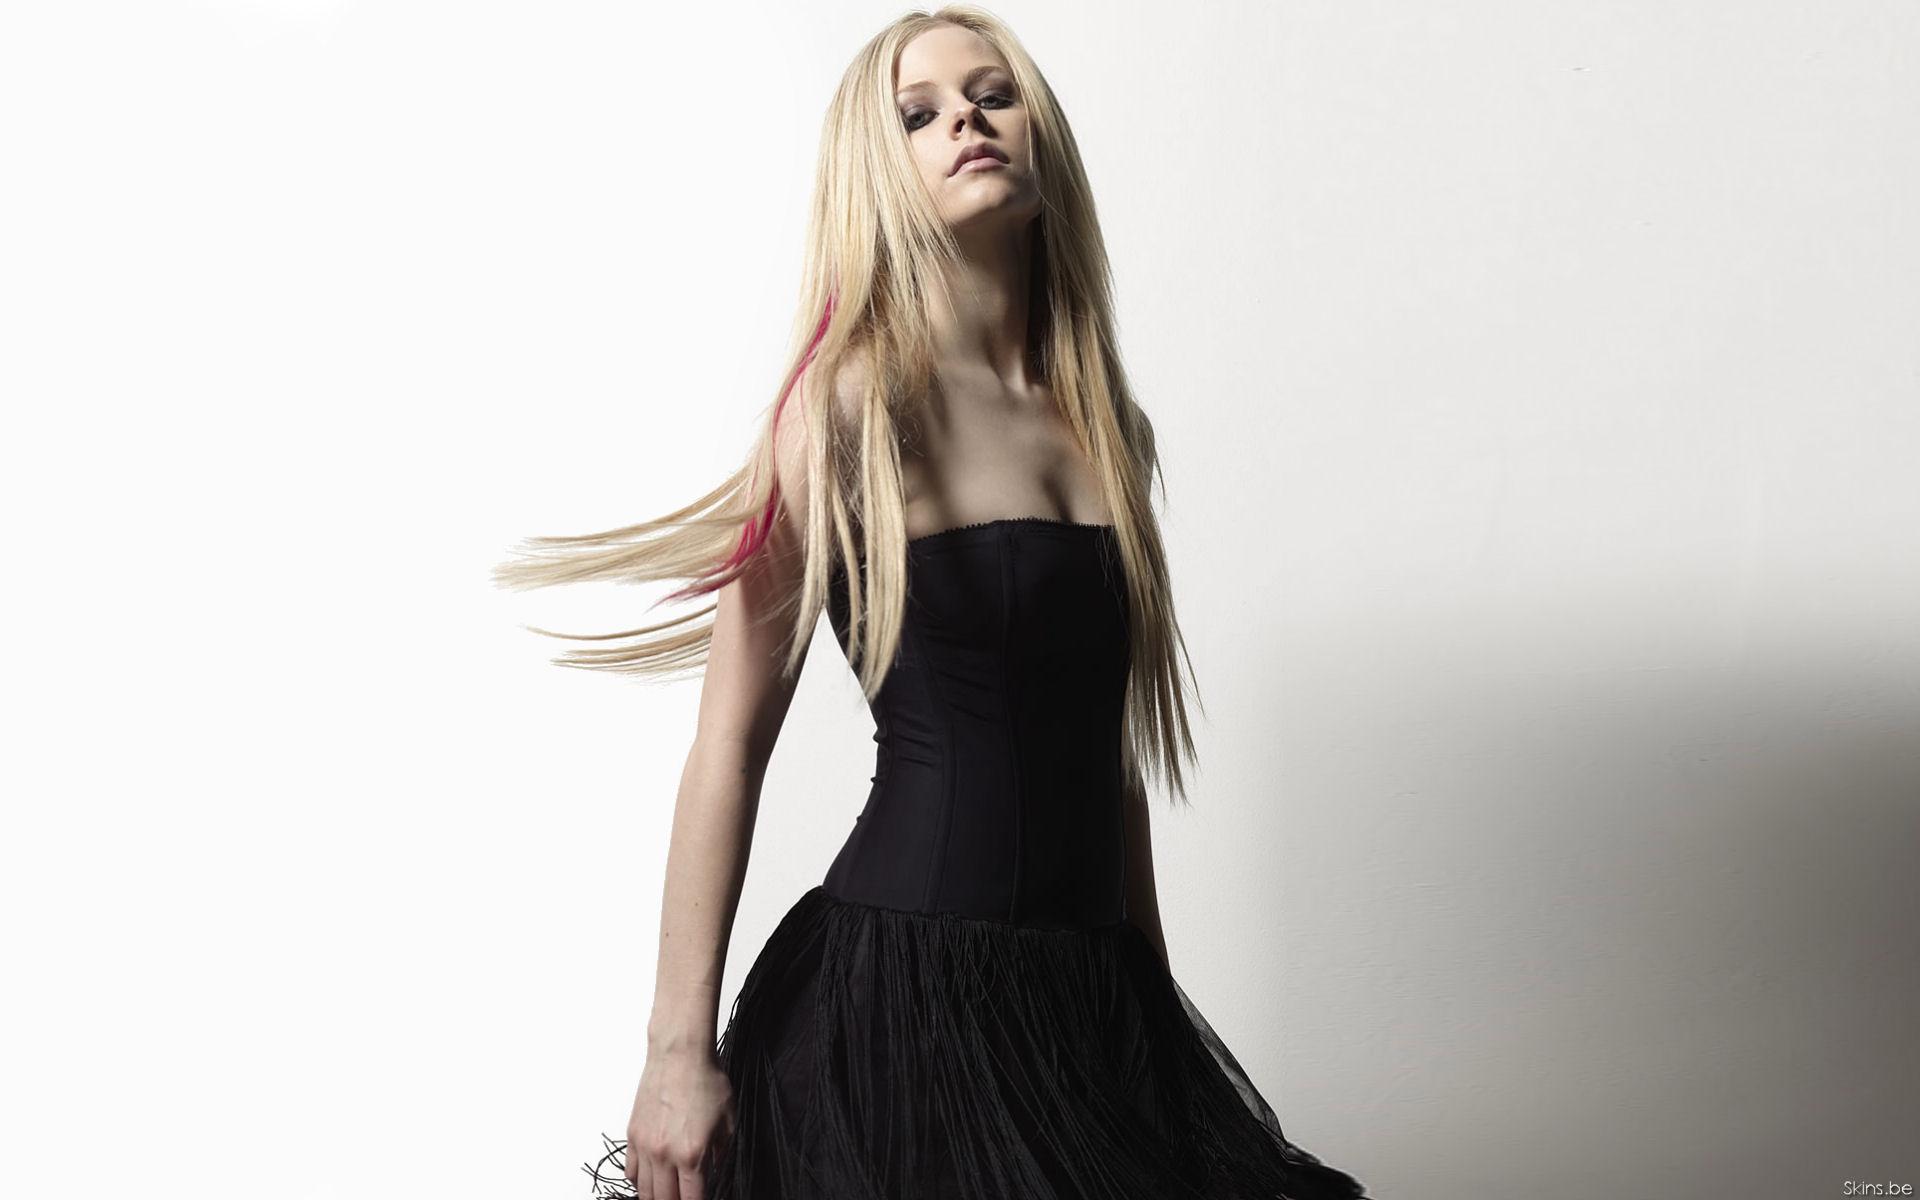 Avril Lavigne 1 Wallpapers: Avril Lavigne Desktop Wallpaper Free Download In